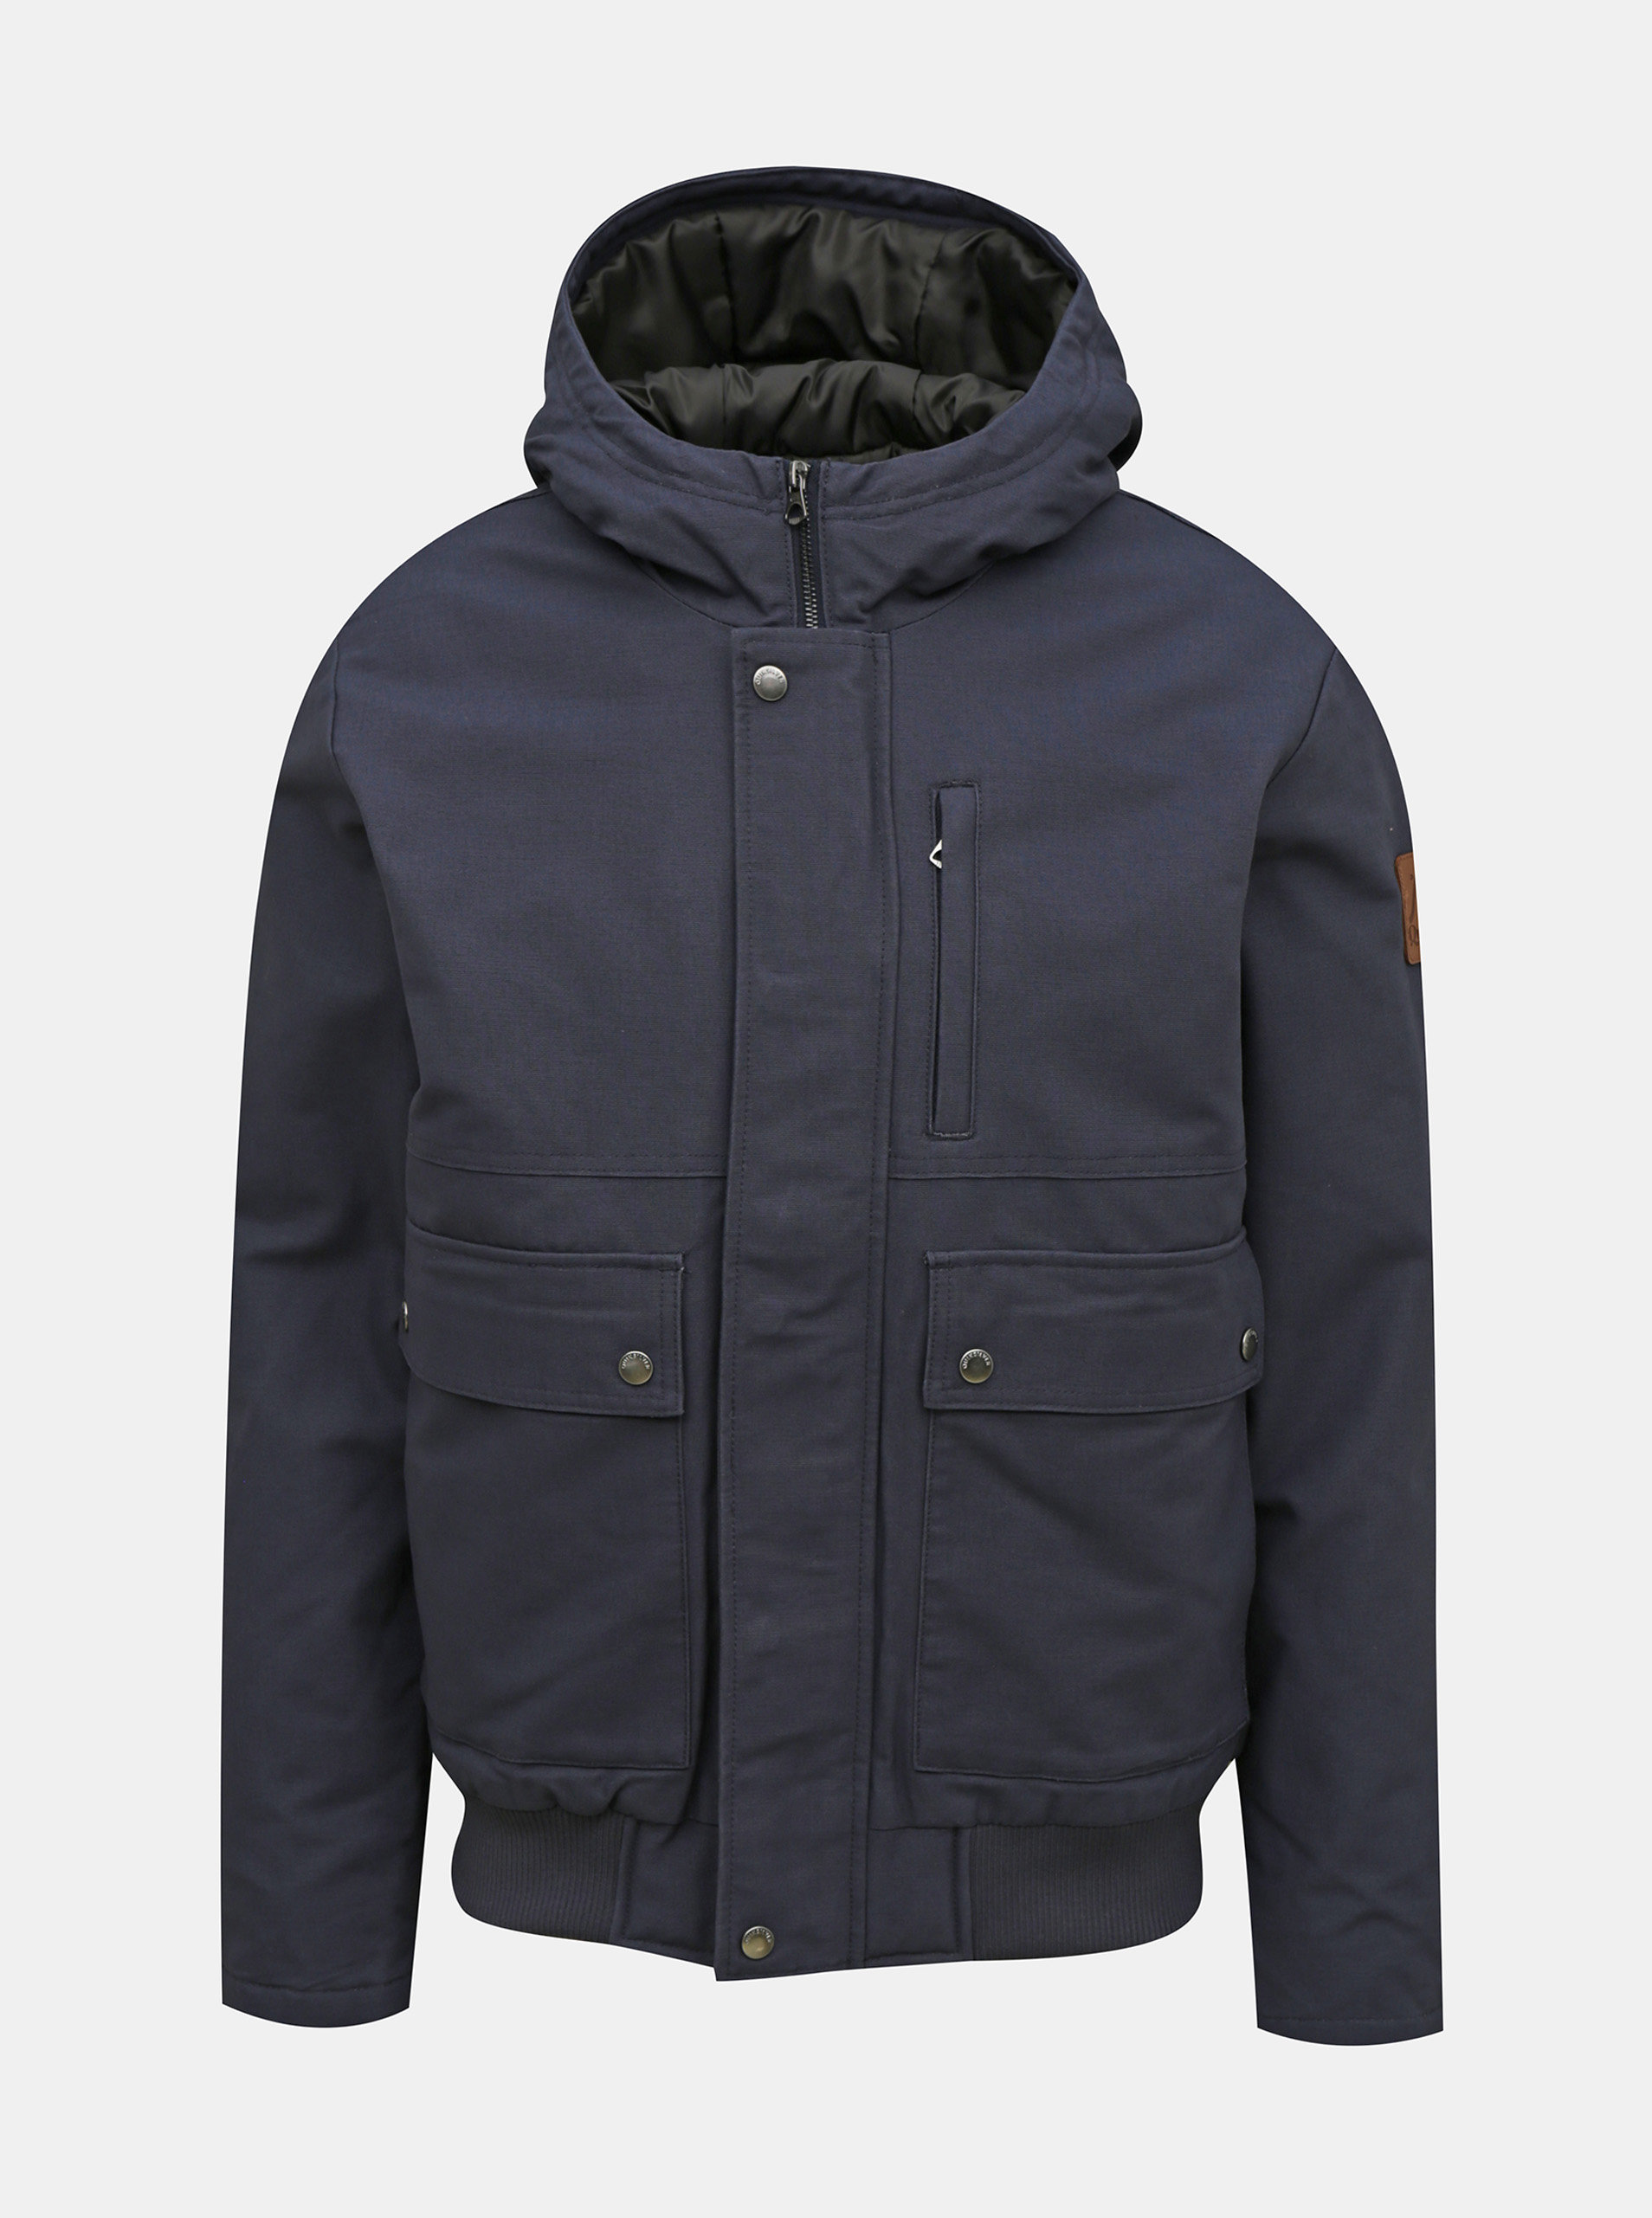 Tmavomodrá zimná bunda Quiksilver